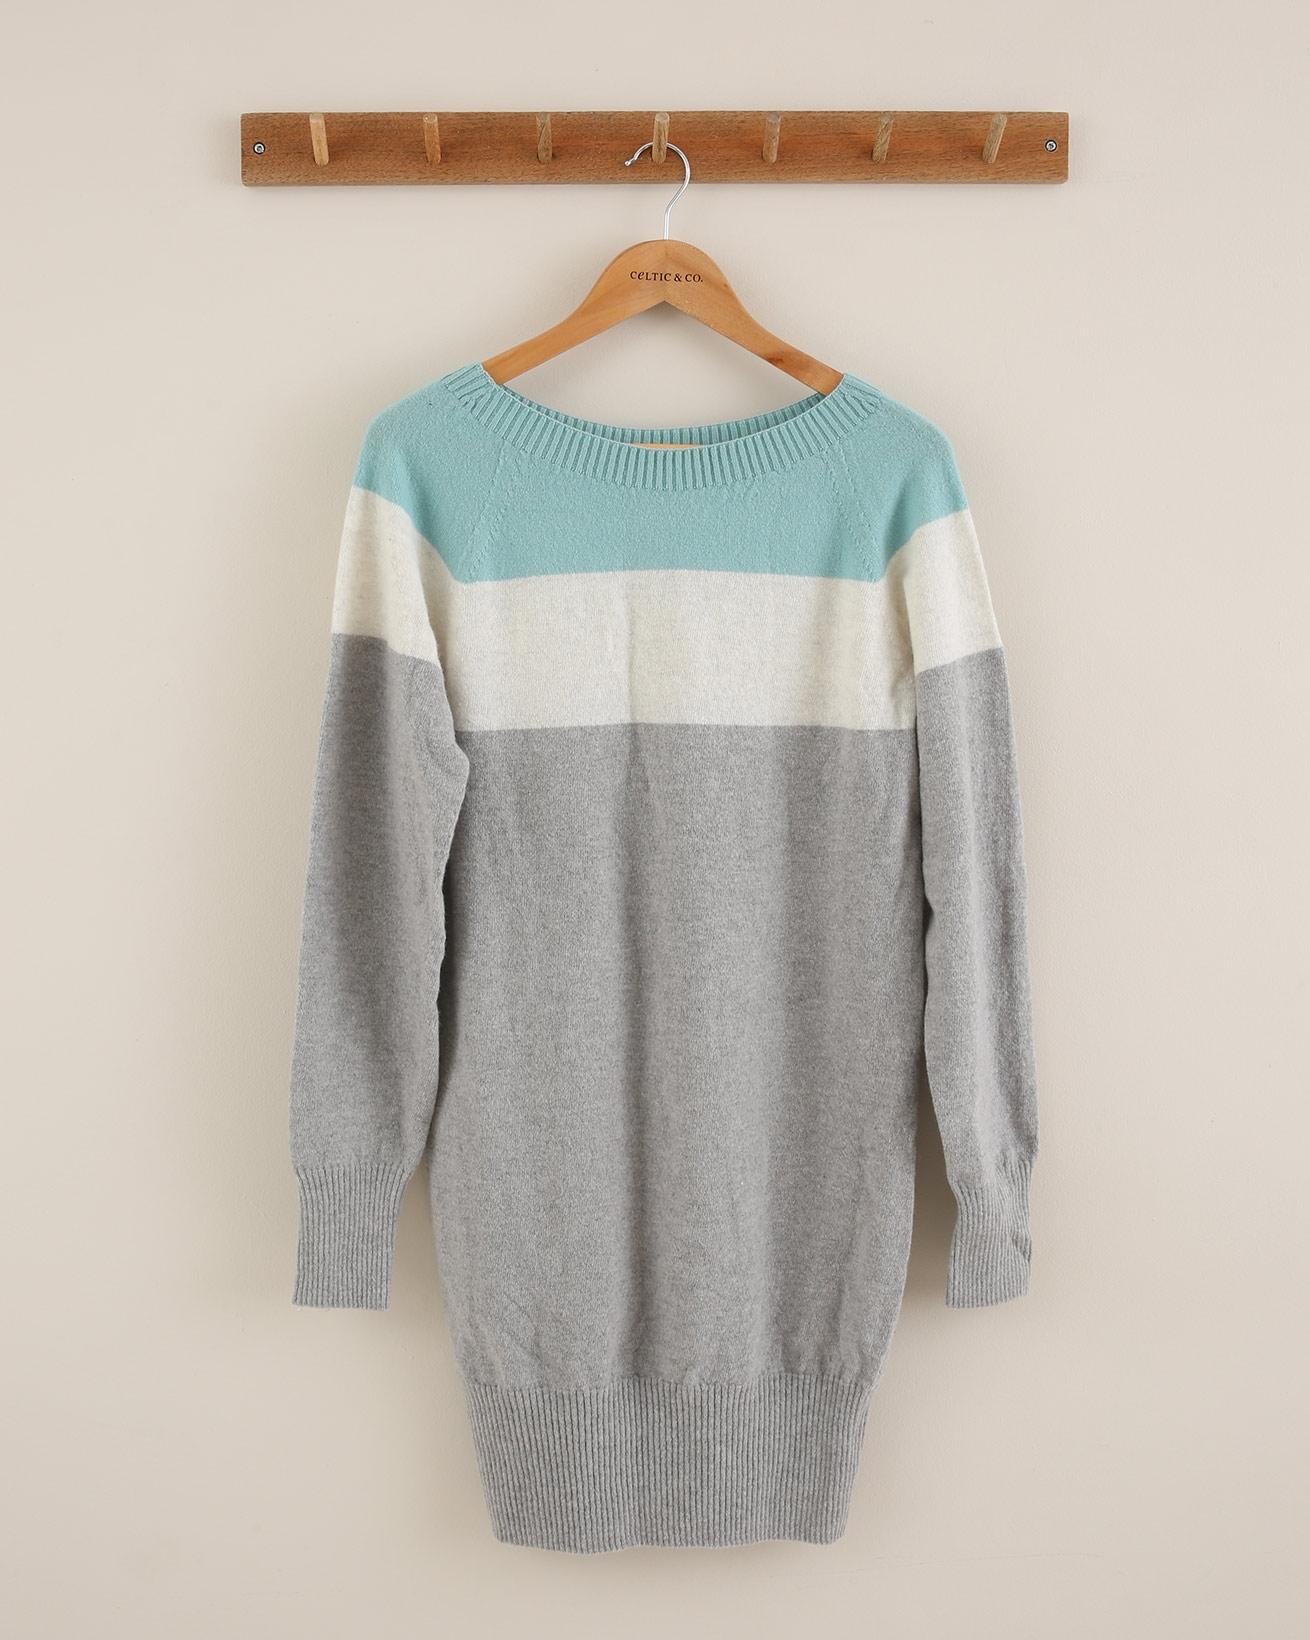 Supersoft Slouch Dress - Size Small - Aqua colourblock - 1695